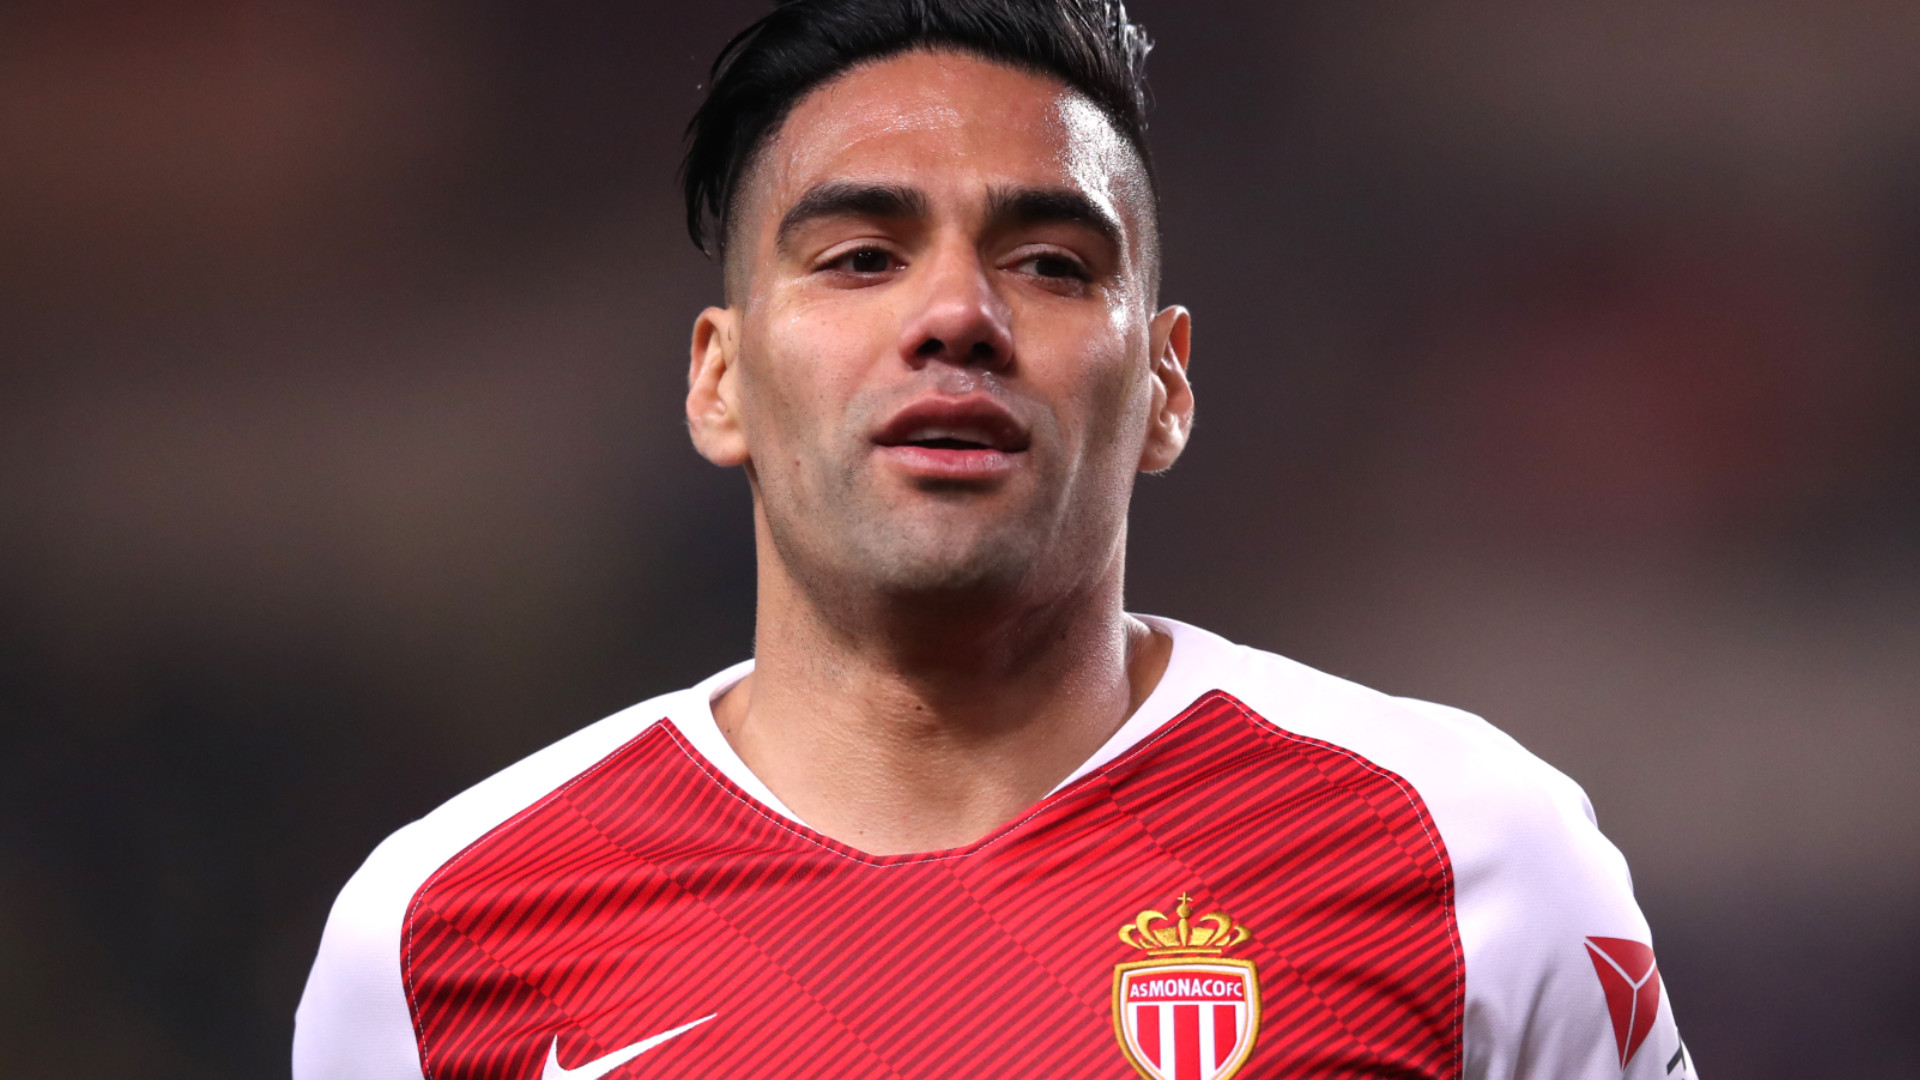 Monaco admitió que recibió ofertas por Radamel Falcao